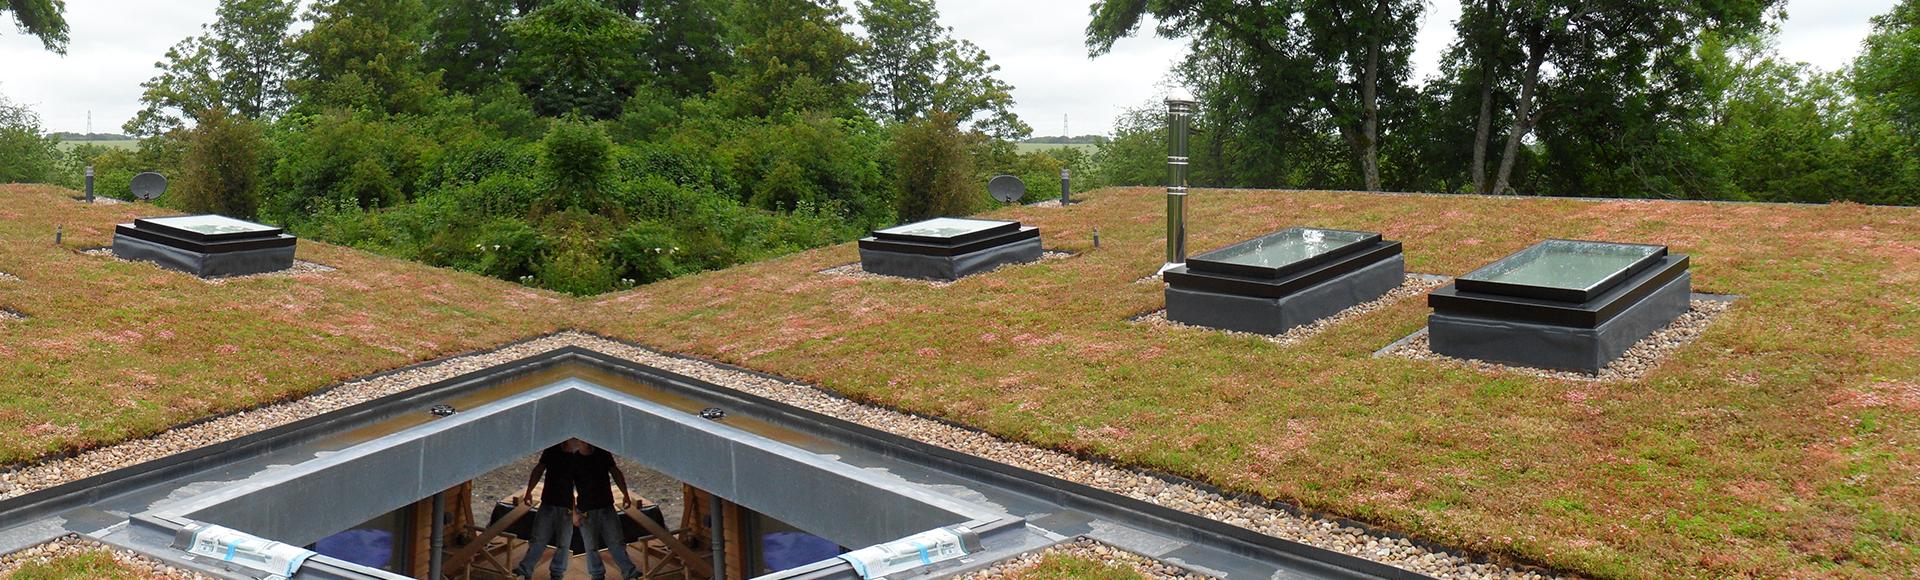 Sedum Green Roof Systems